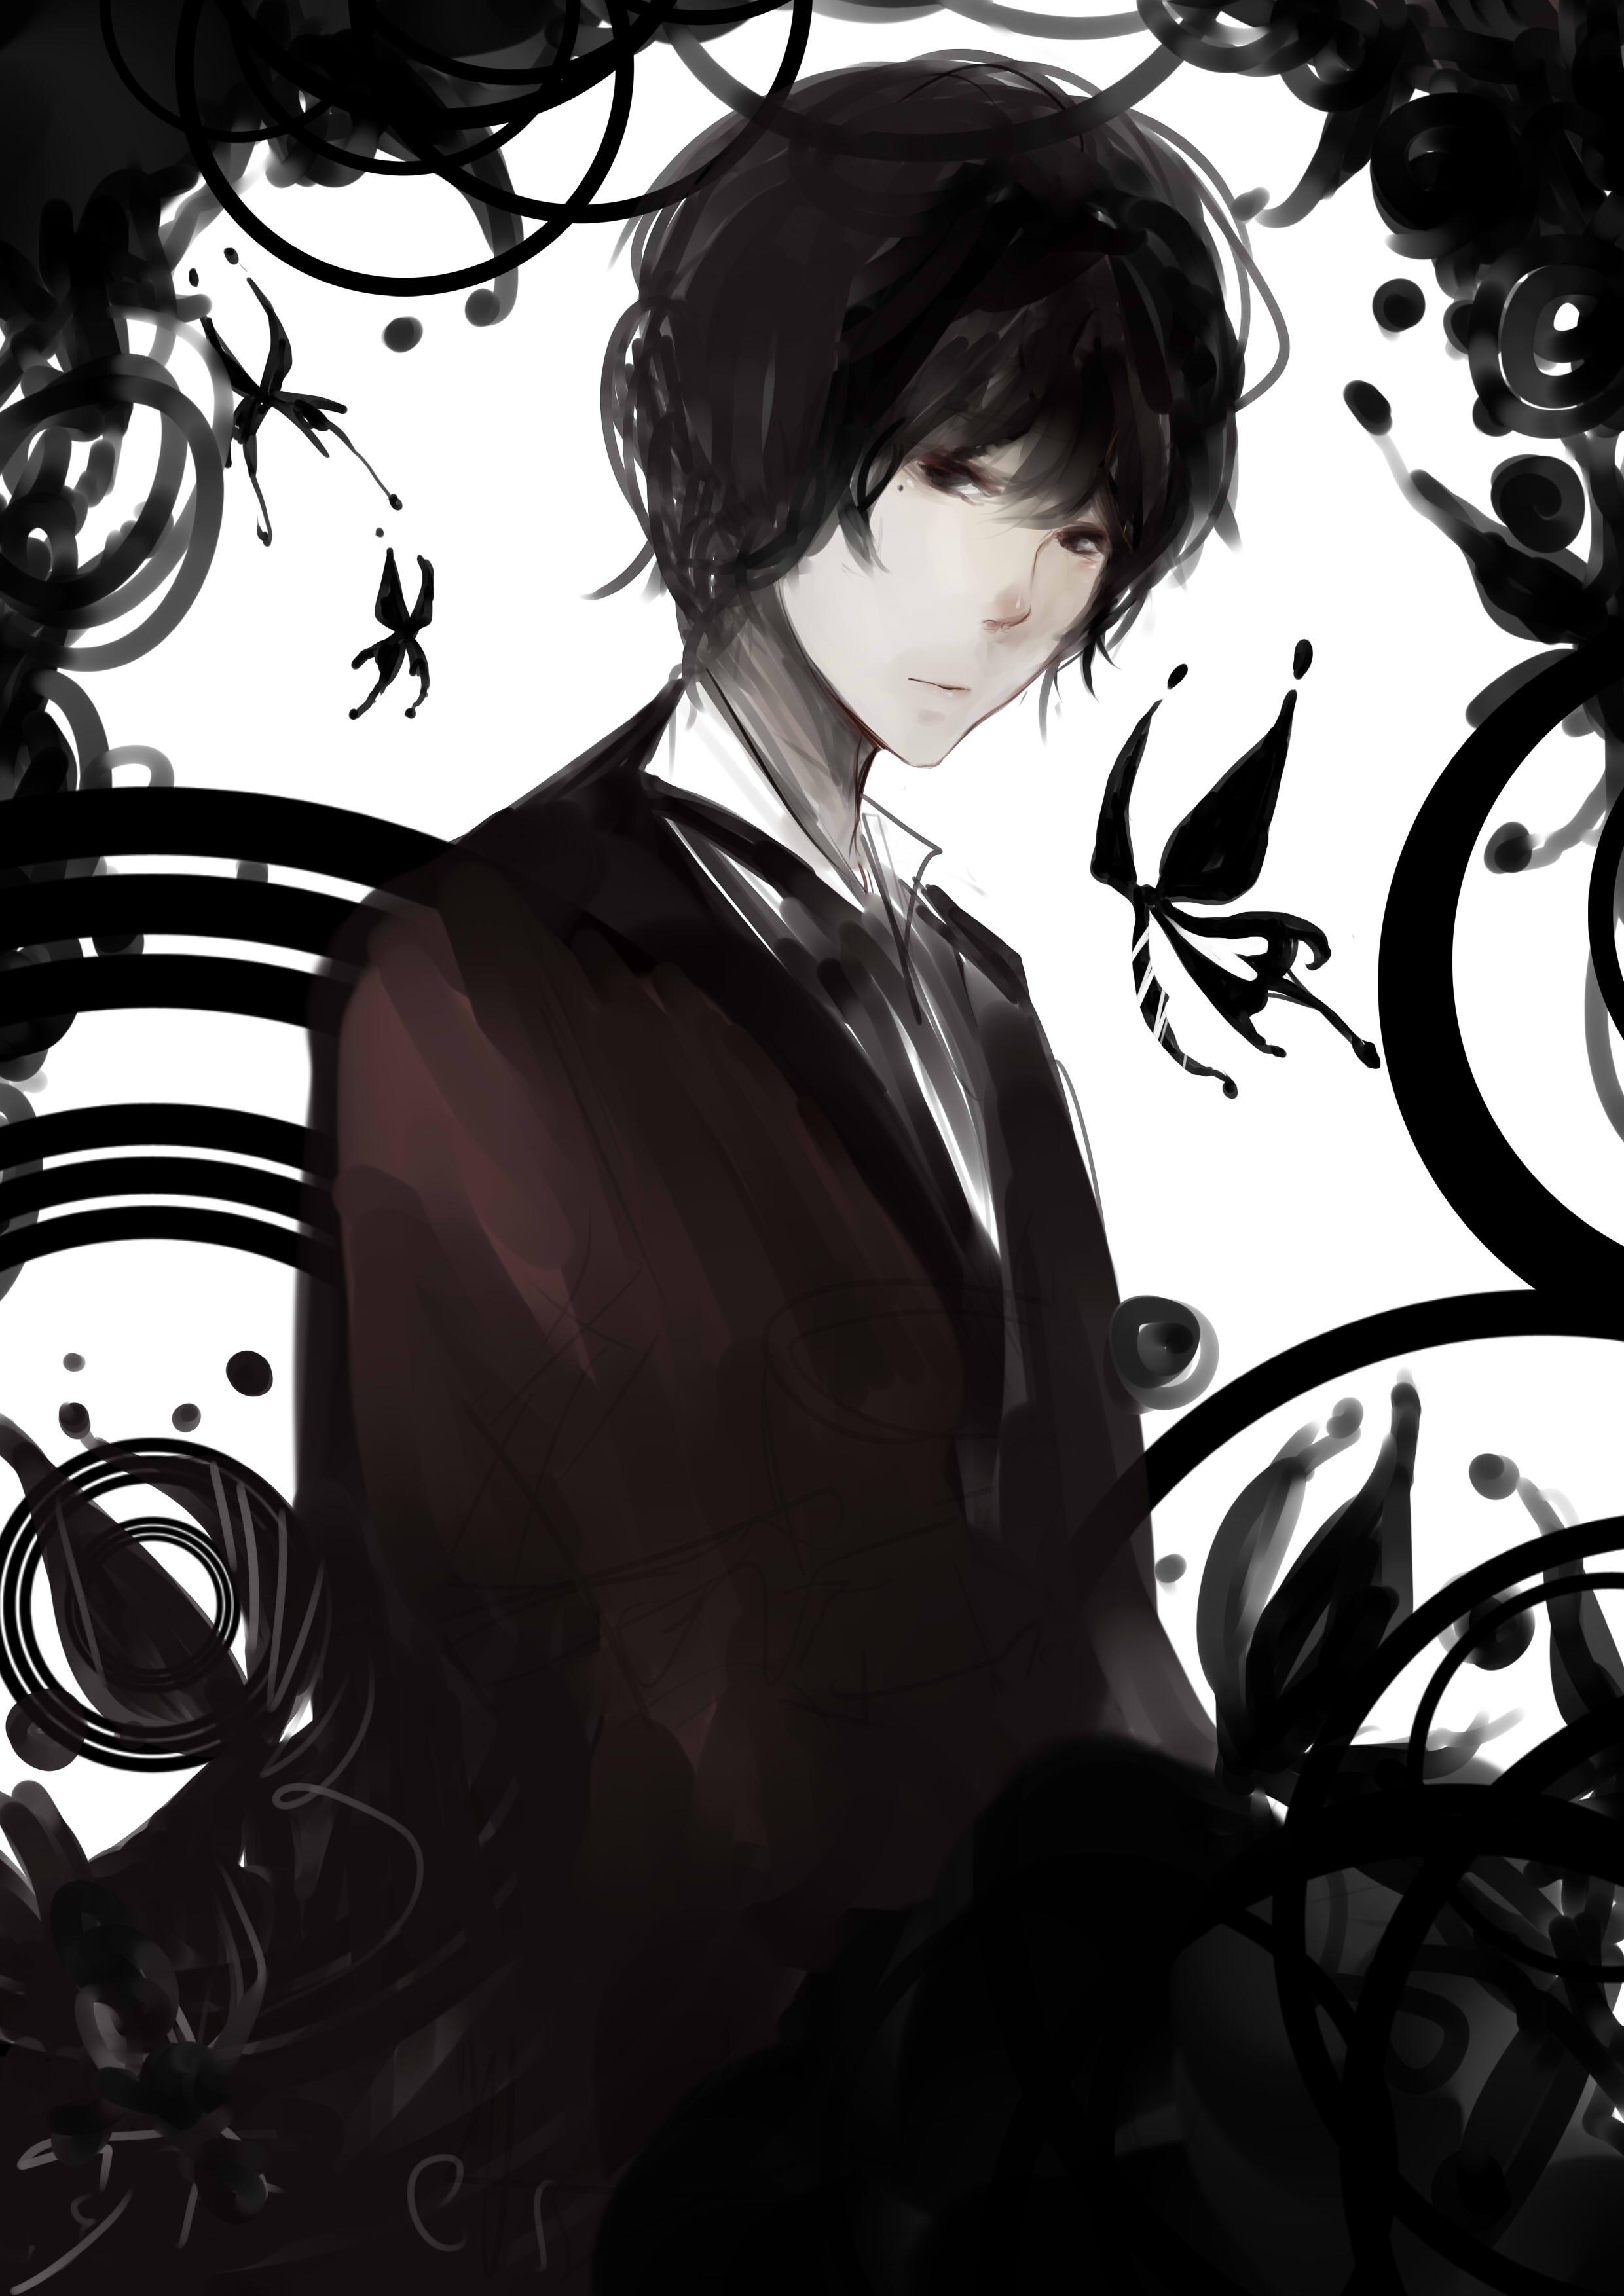 Tyki Mikk Mobile Wallpaper 1163329 Zerochan Anime Image